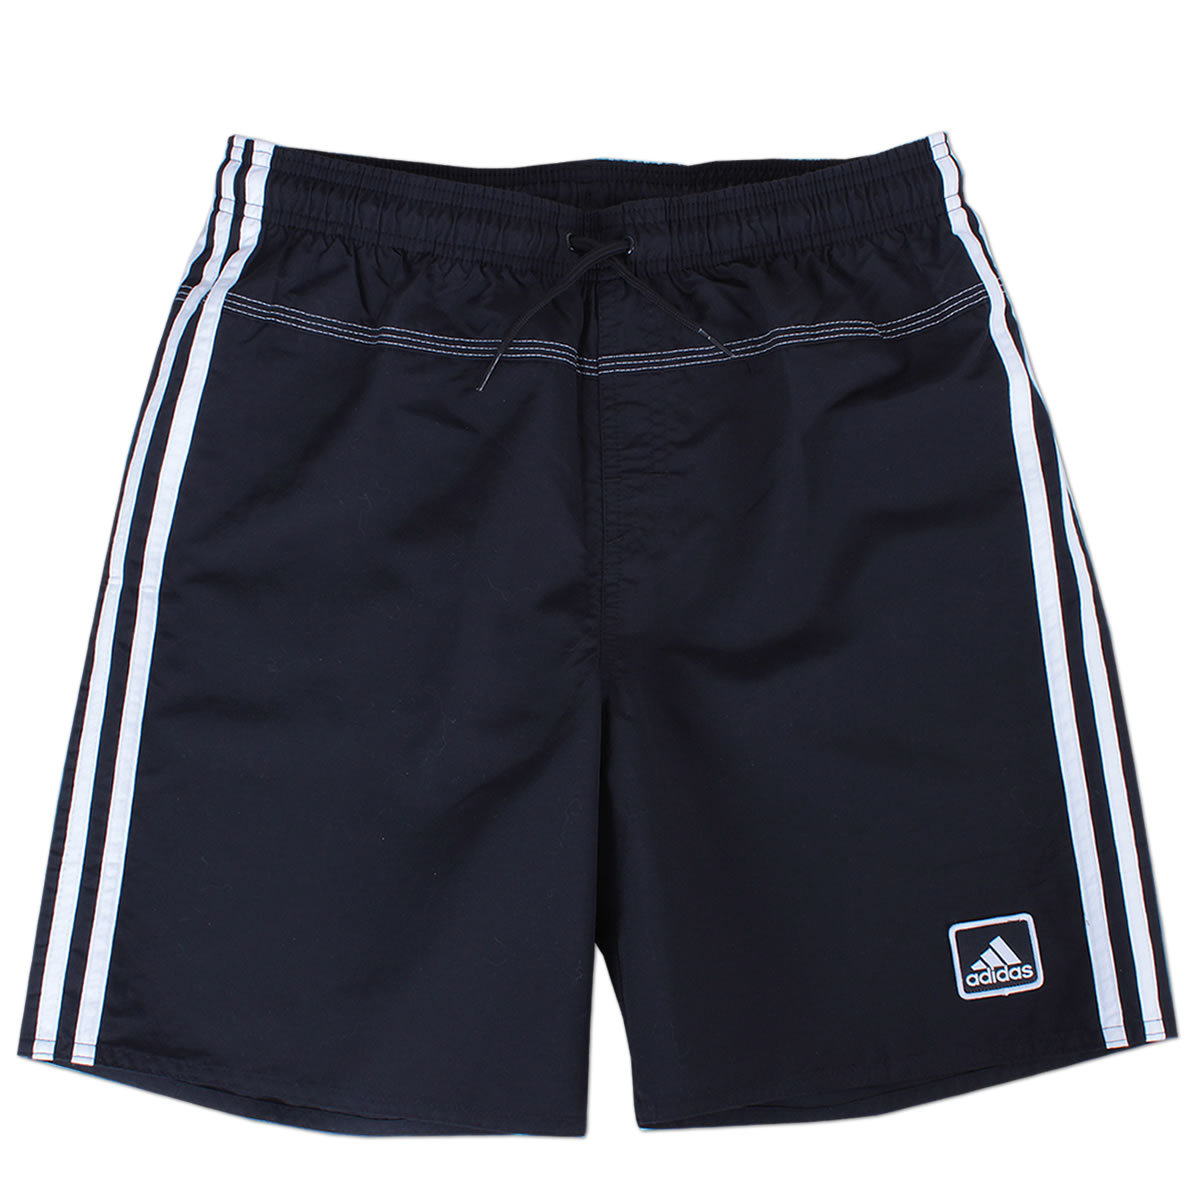 adidas Badeshort 3SA Short Boys CL schwarz (F51252)